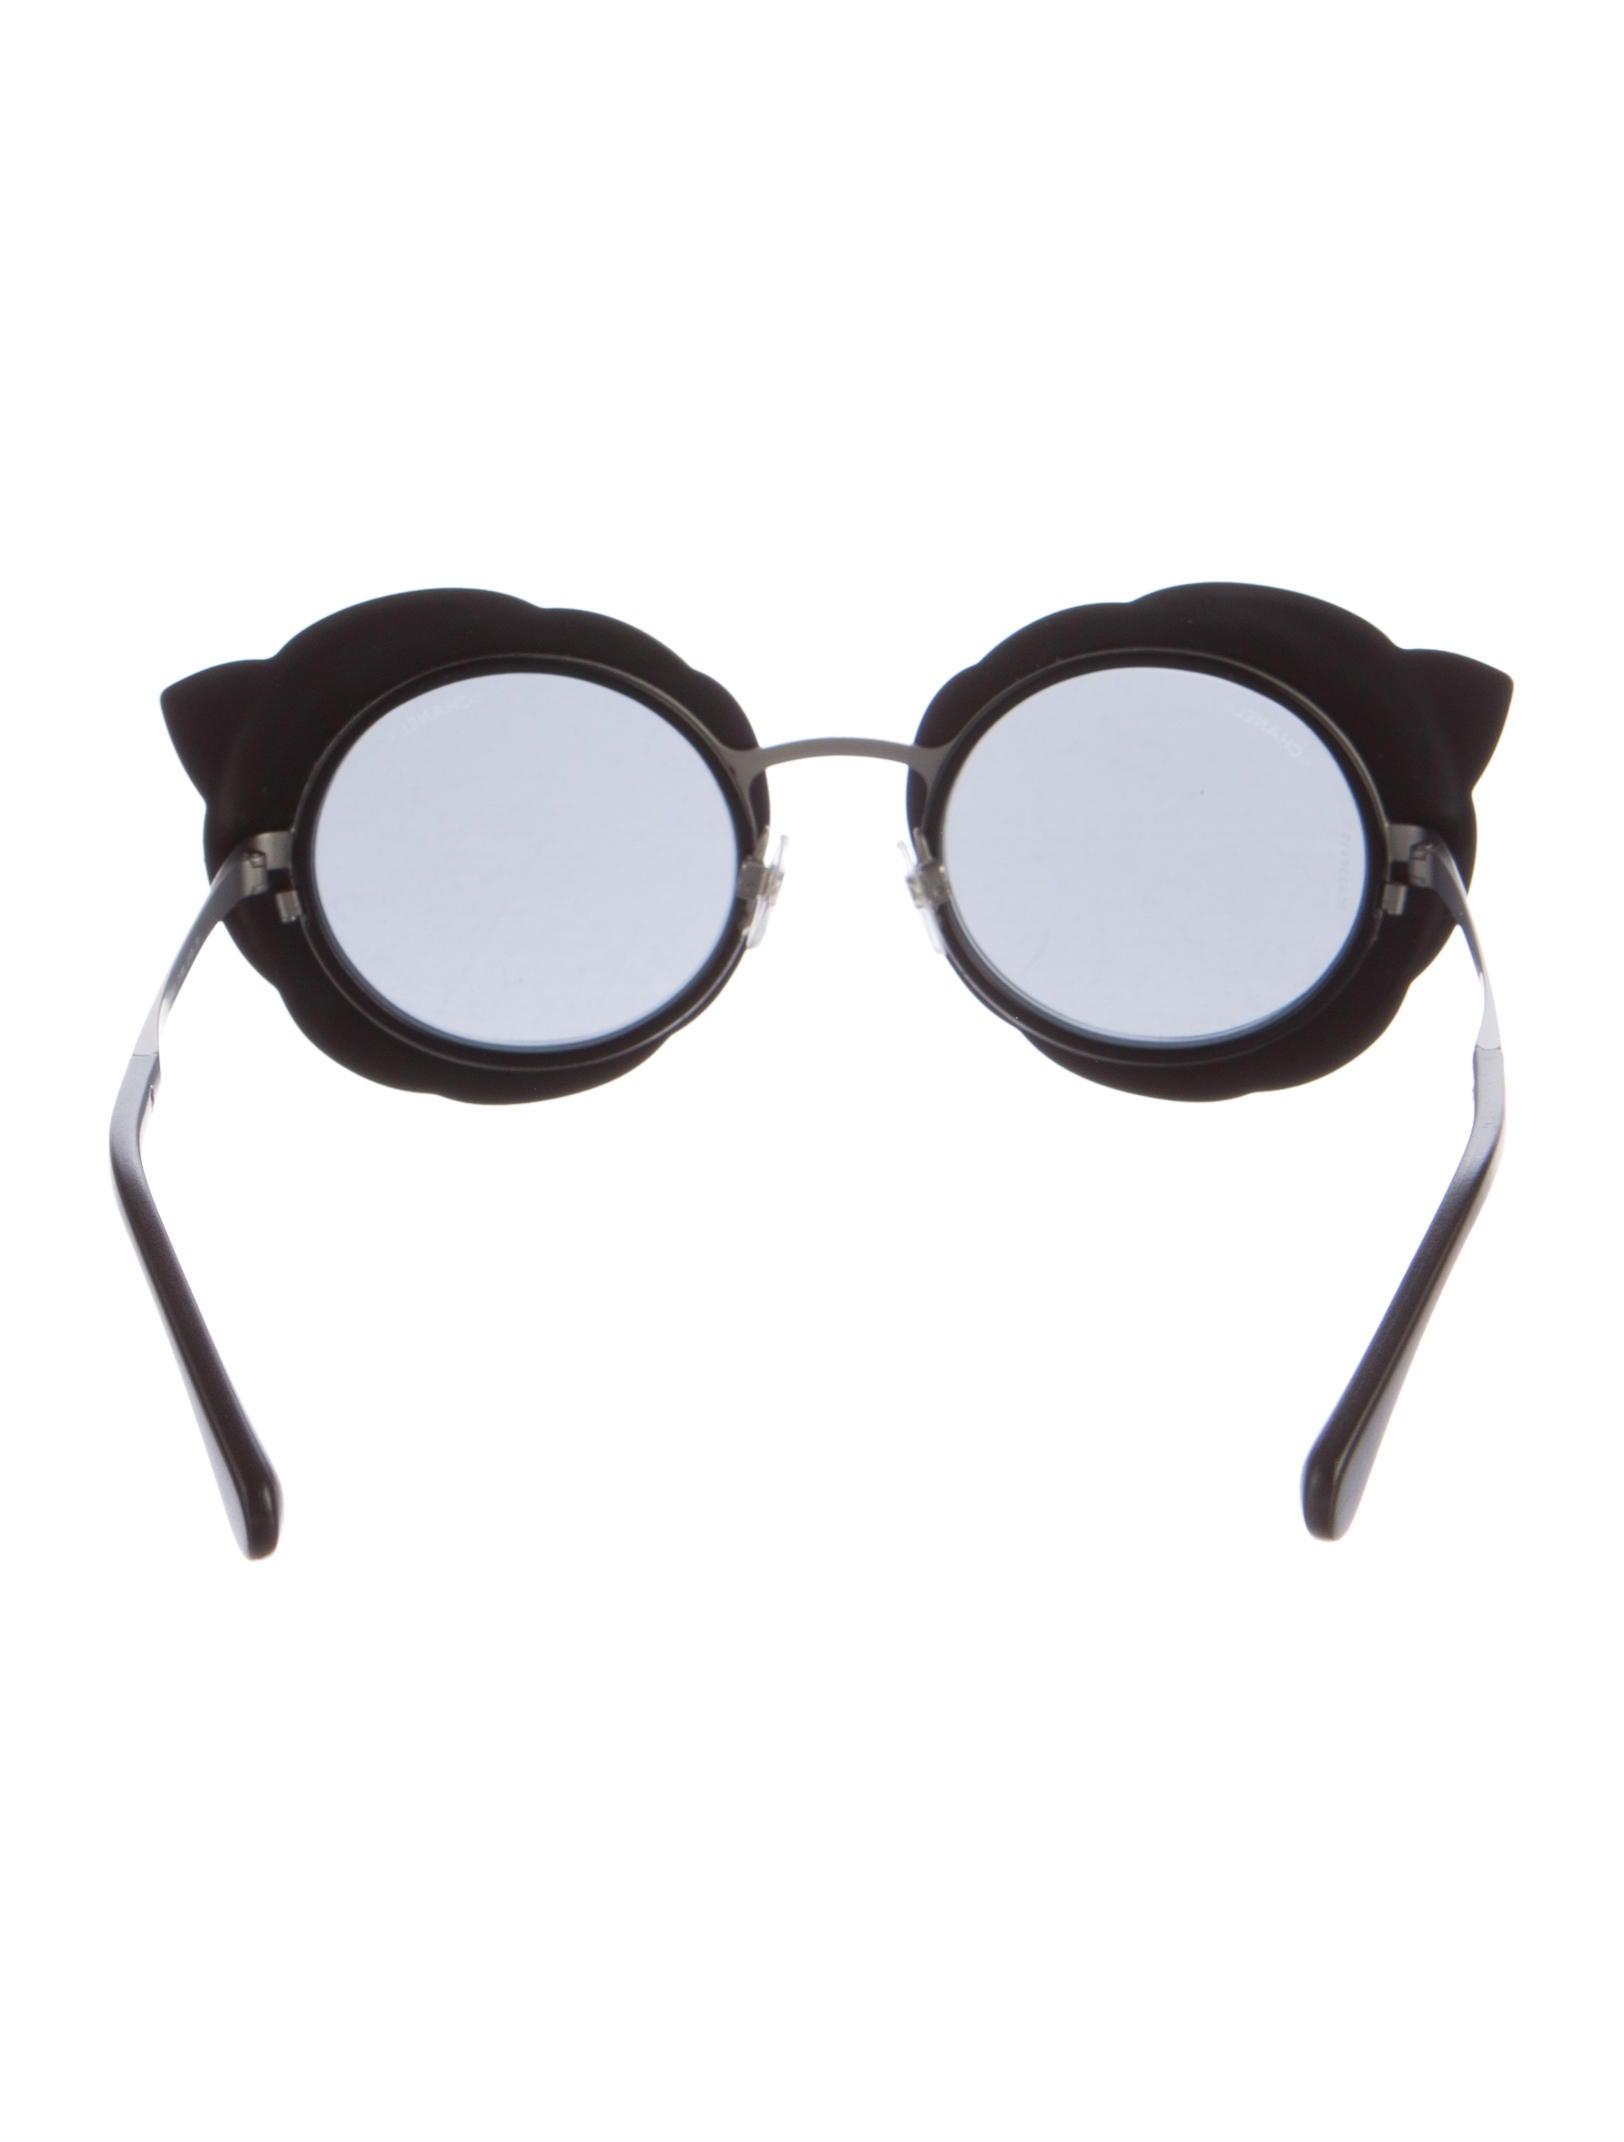 Chanel Round Runway Sunglasses - Accessories - CHA158628 ...